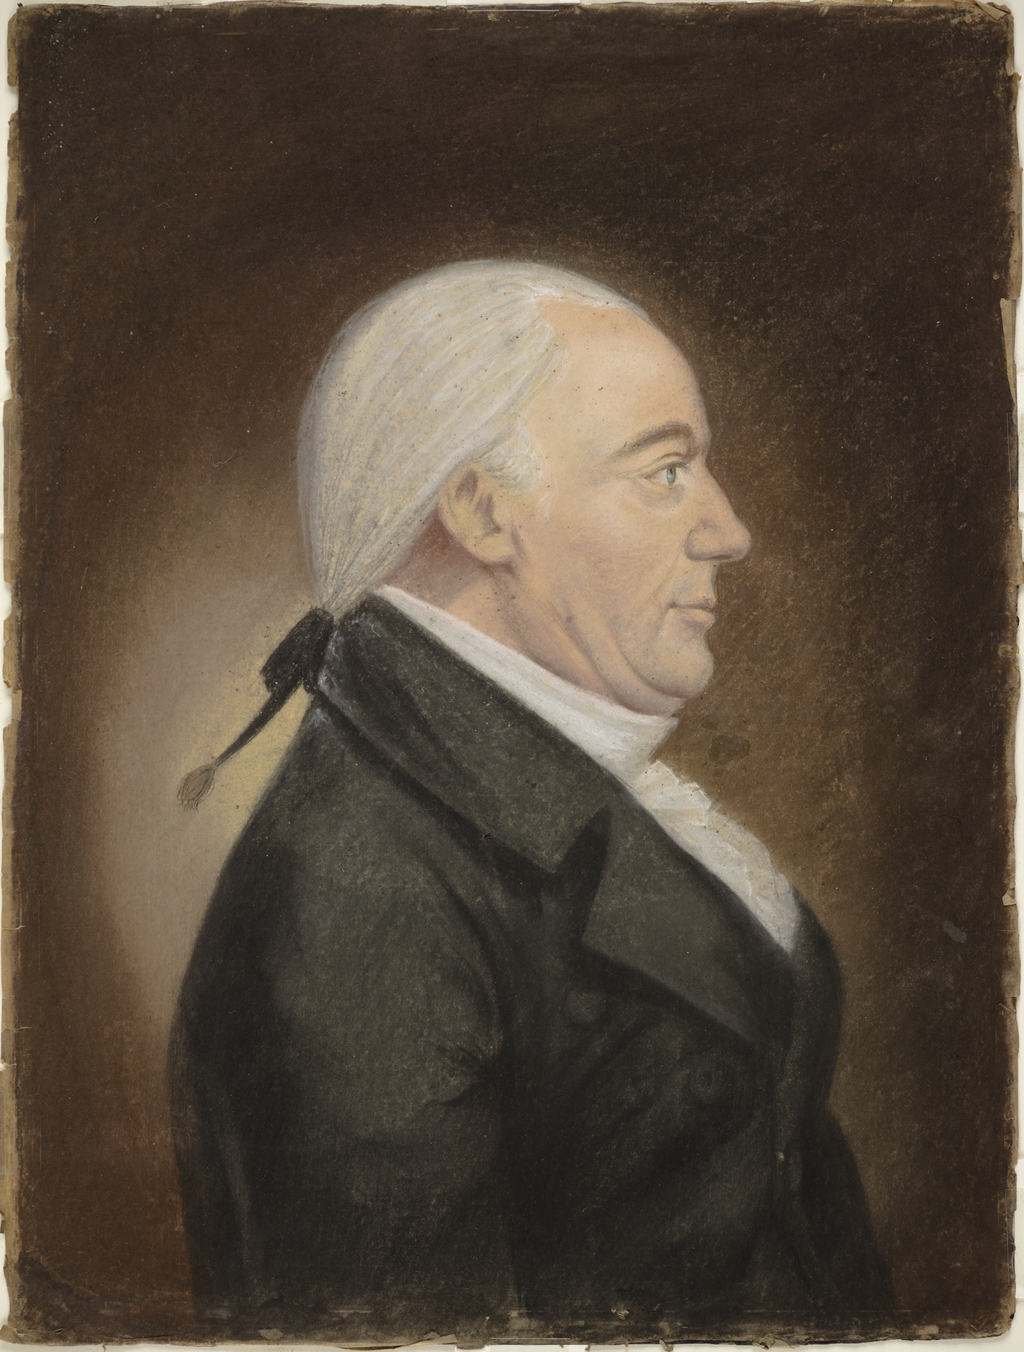 Le Docteur Charles Blake